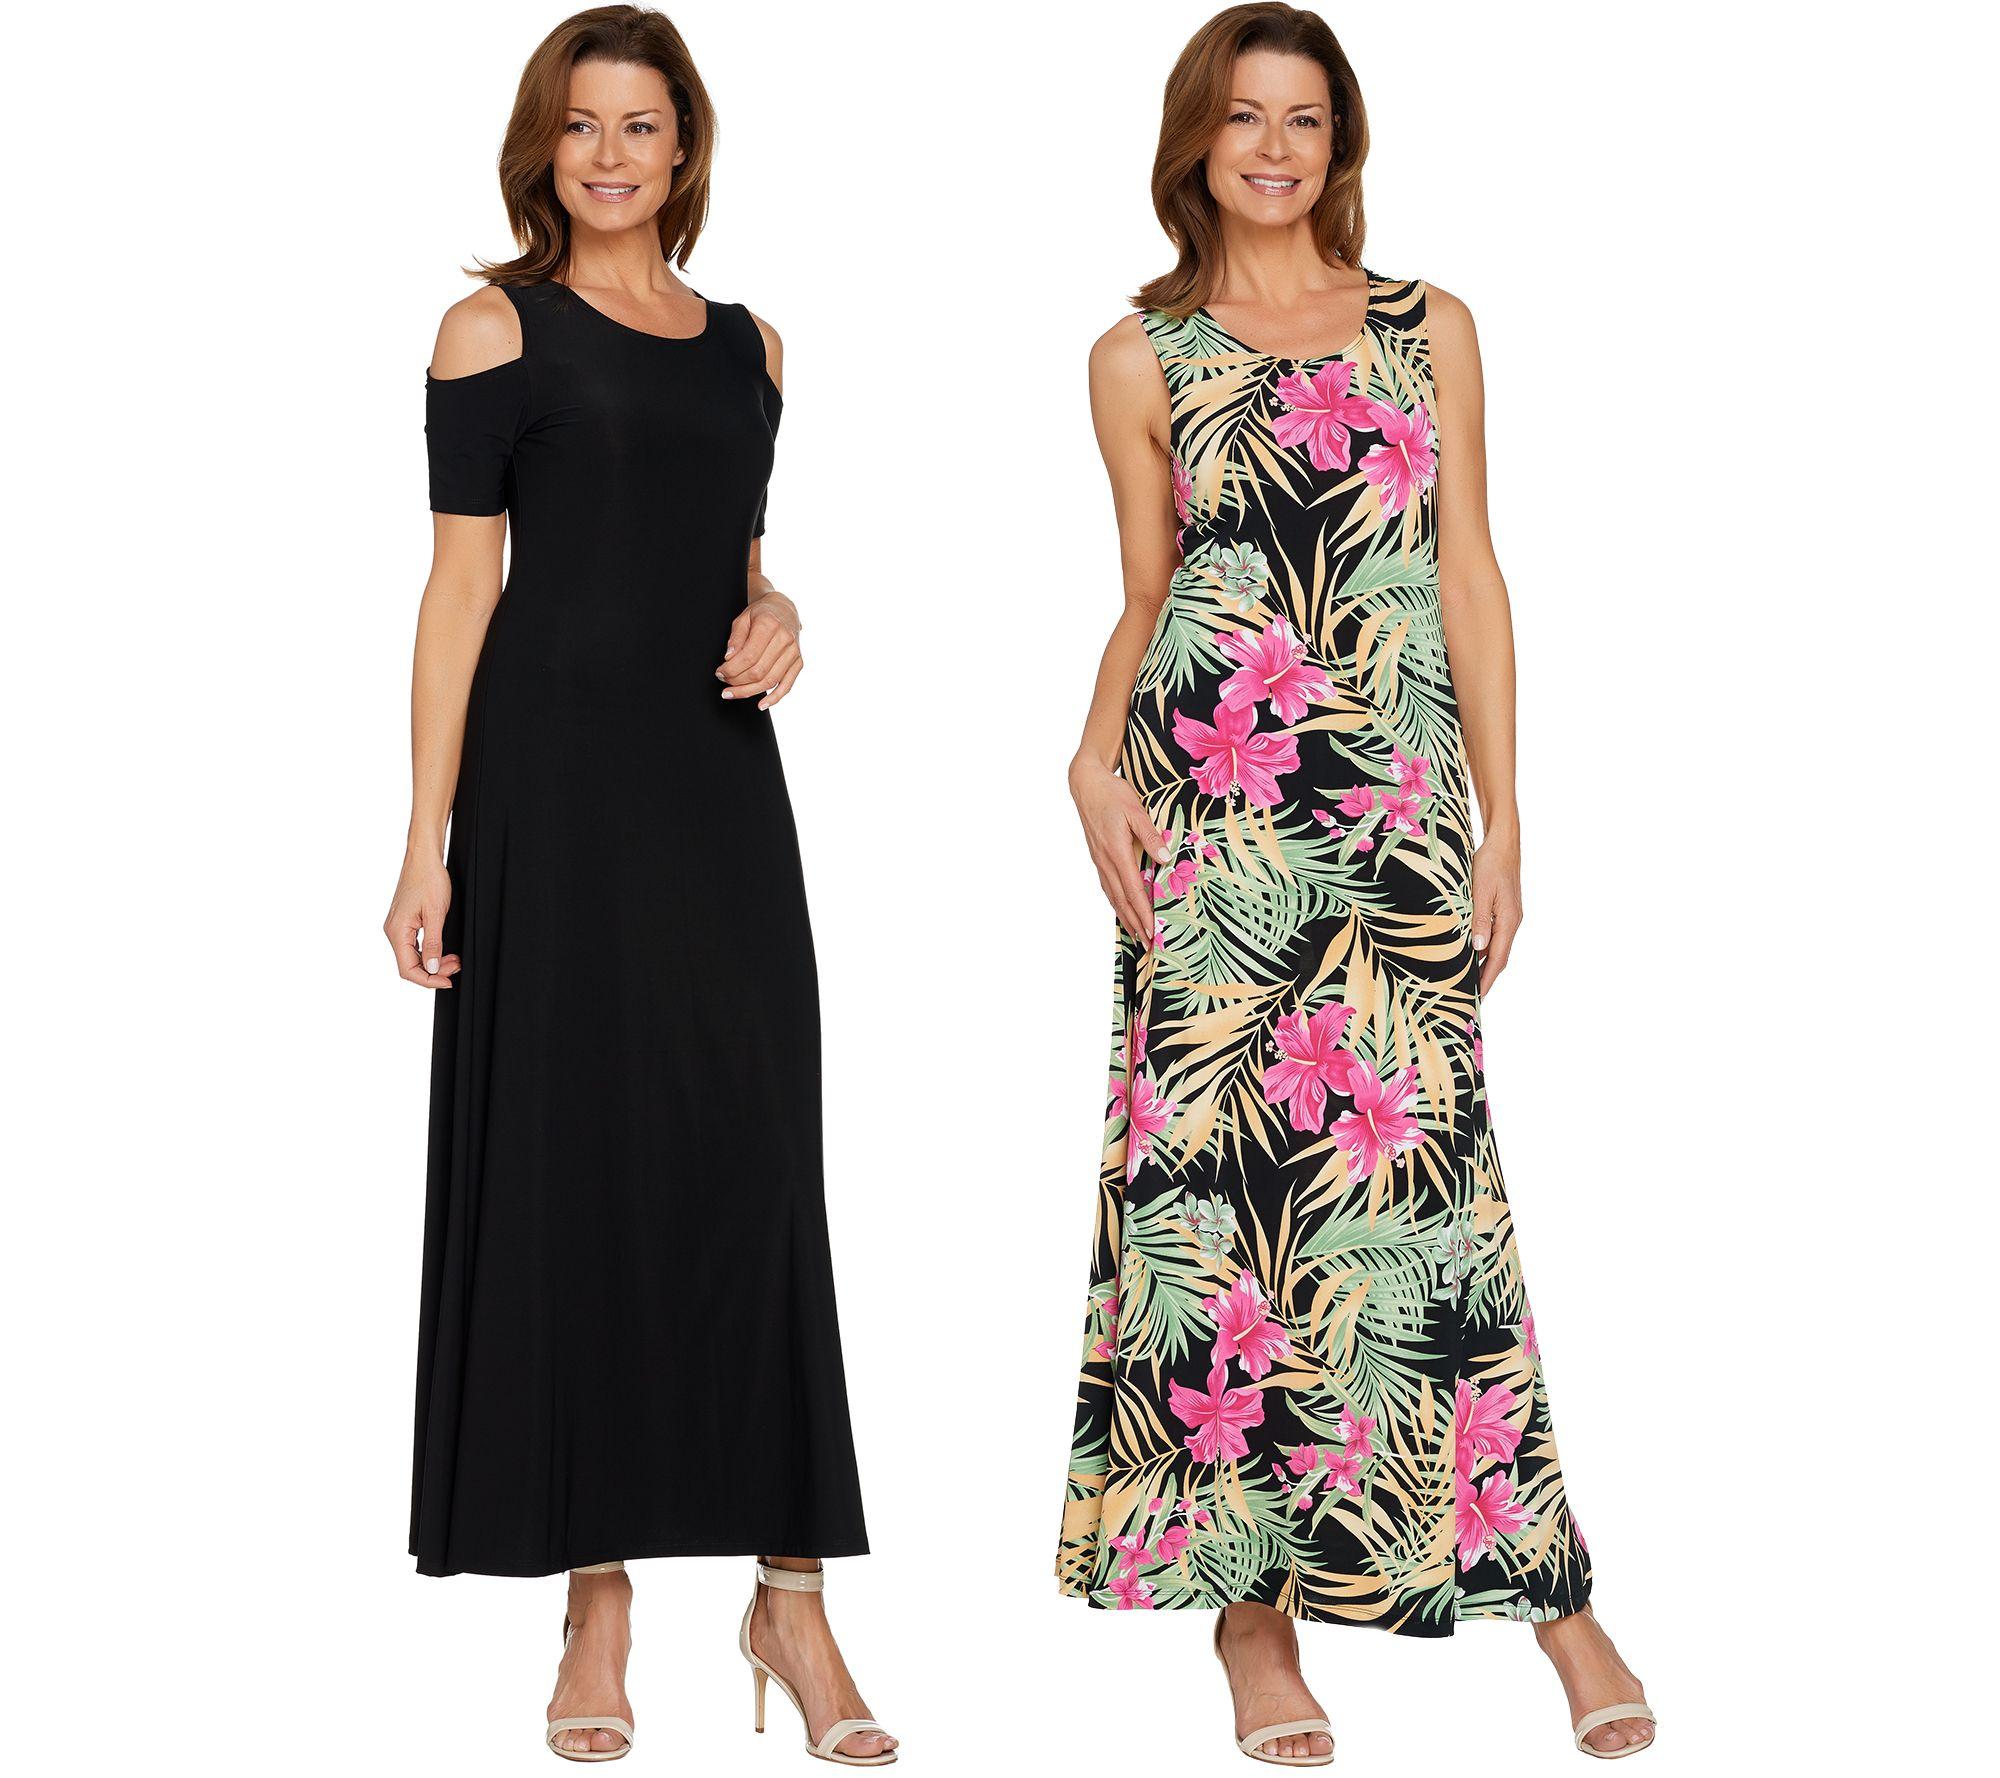 Attitudes by Renee Regular Solid & Printed Set of 2 Dresses — QVC.com